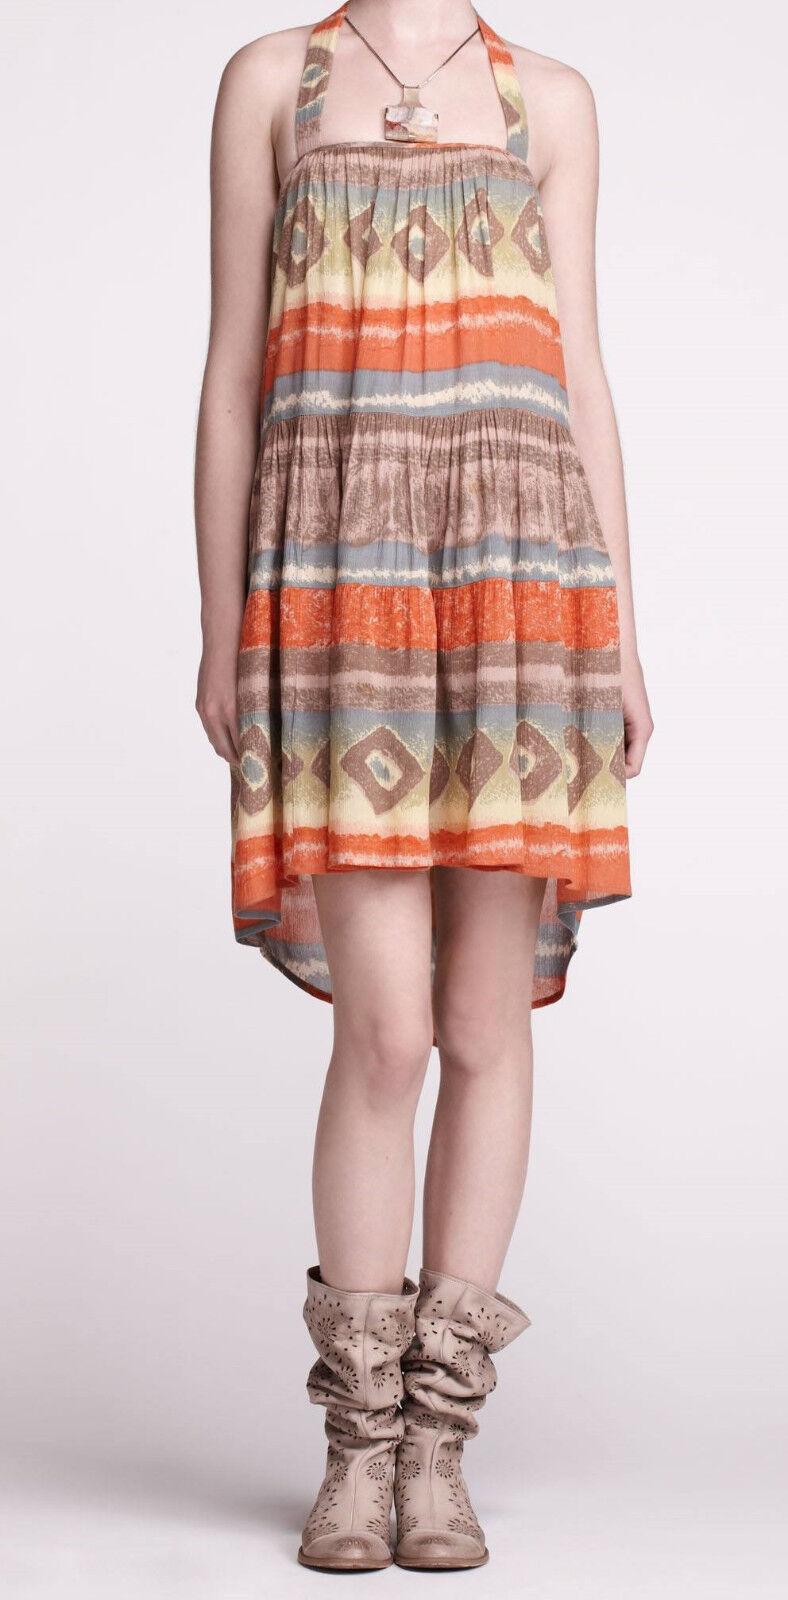 Maple Topock Halter Dress Größe XS, M, L Orange Farbe NW ANTHROPOLOGIE Tag